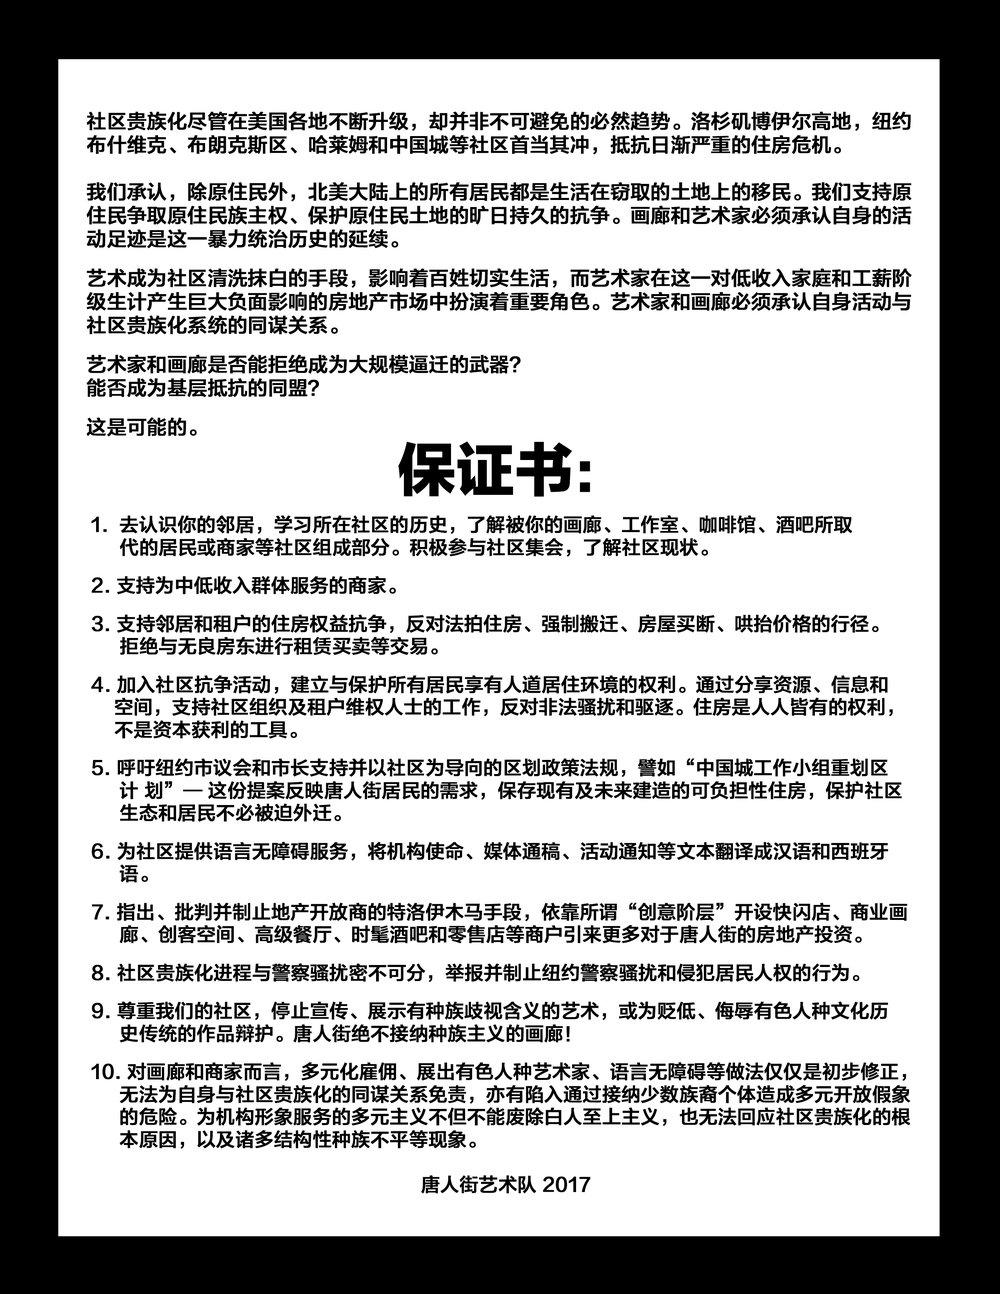 NewPledge_Chi.jpg